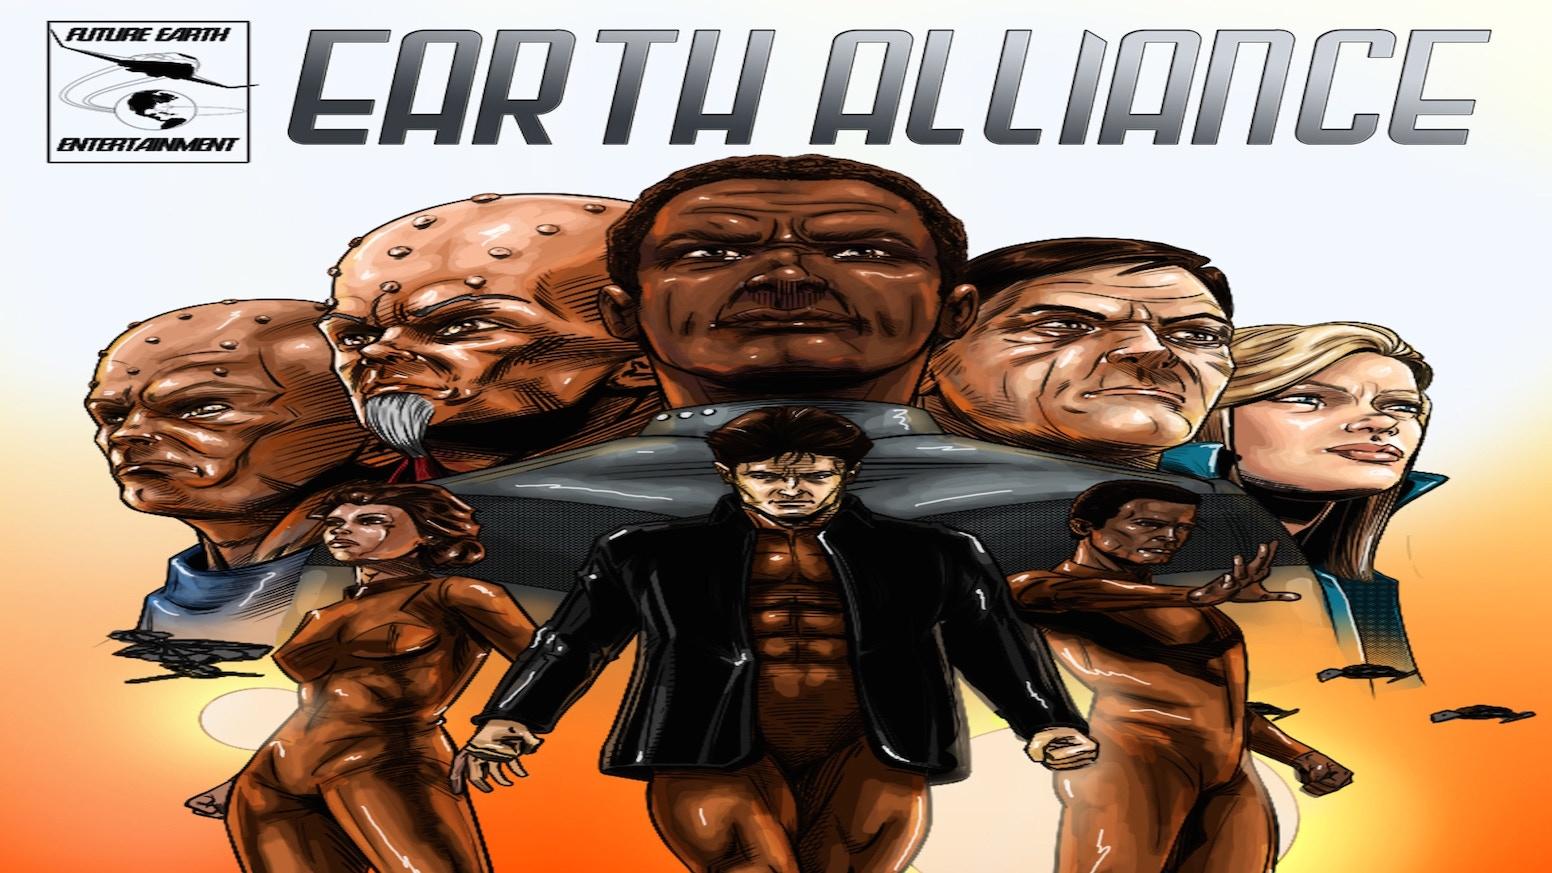 An epic space saga of war, politics and family dynamics.